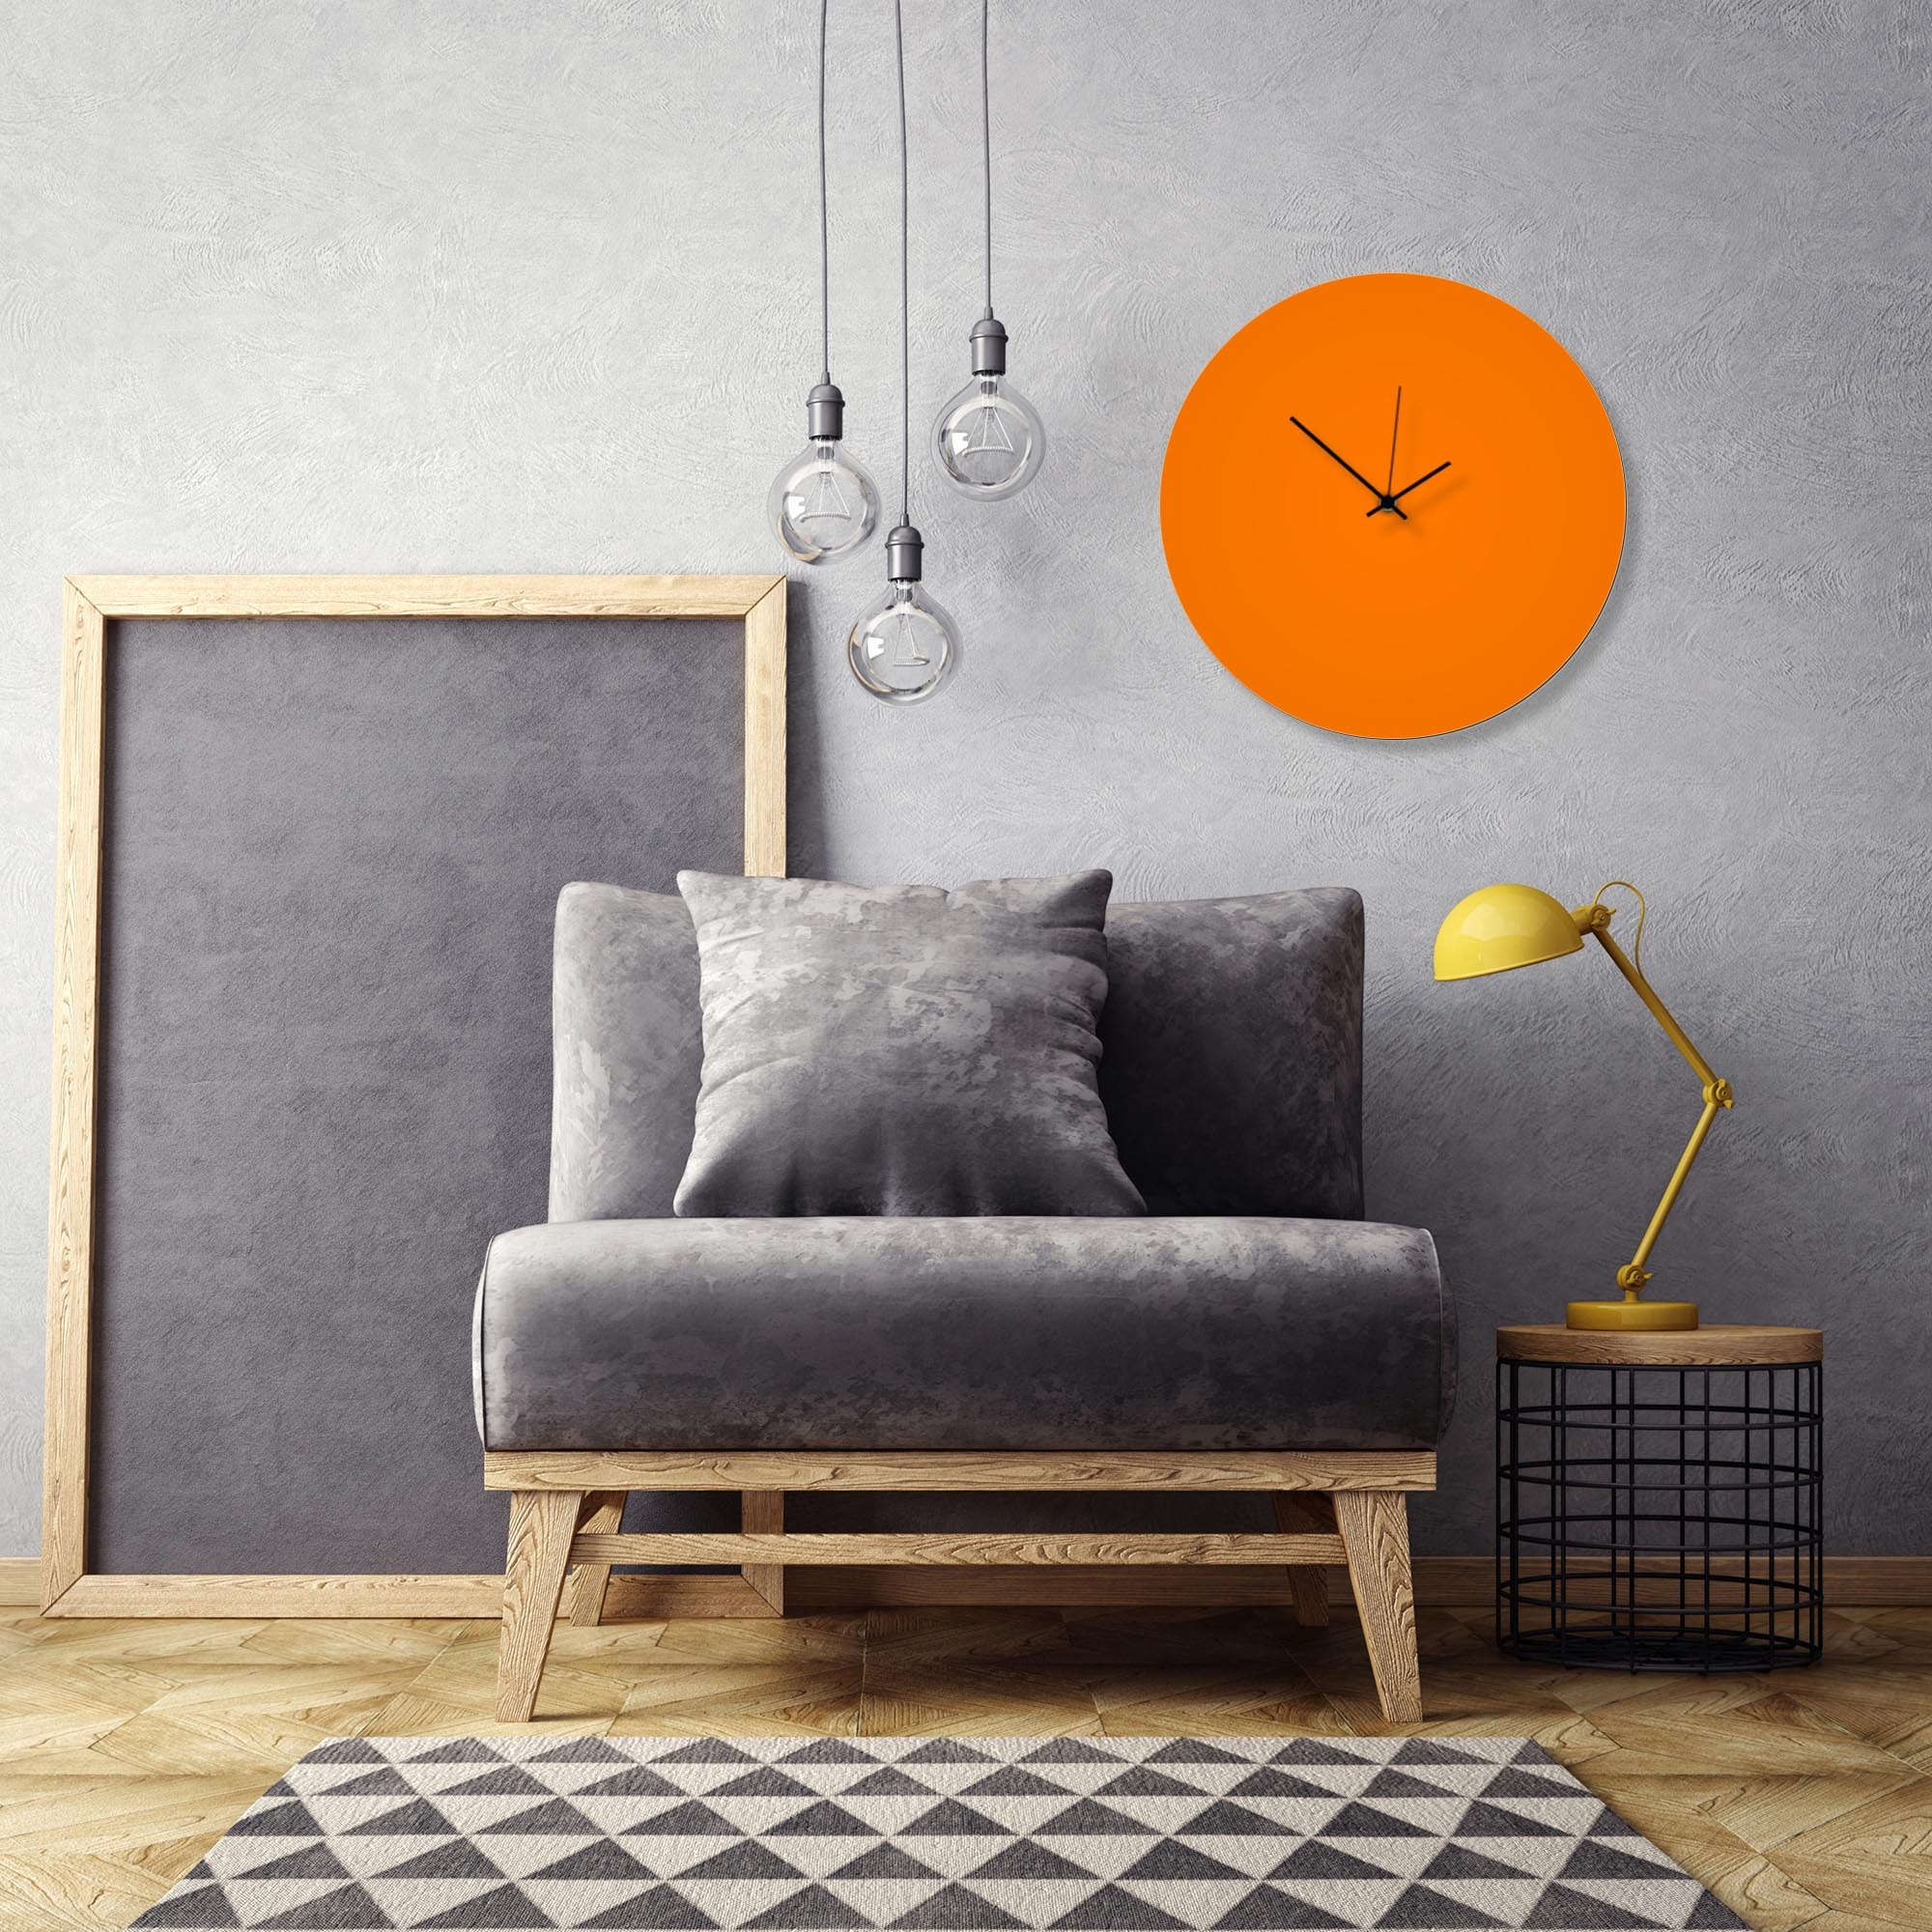 Orangeout Black Circle Clock Large by Adam Schwoeppe Contemporary Clock on Aluminum Polymetal - Alternate View 1